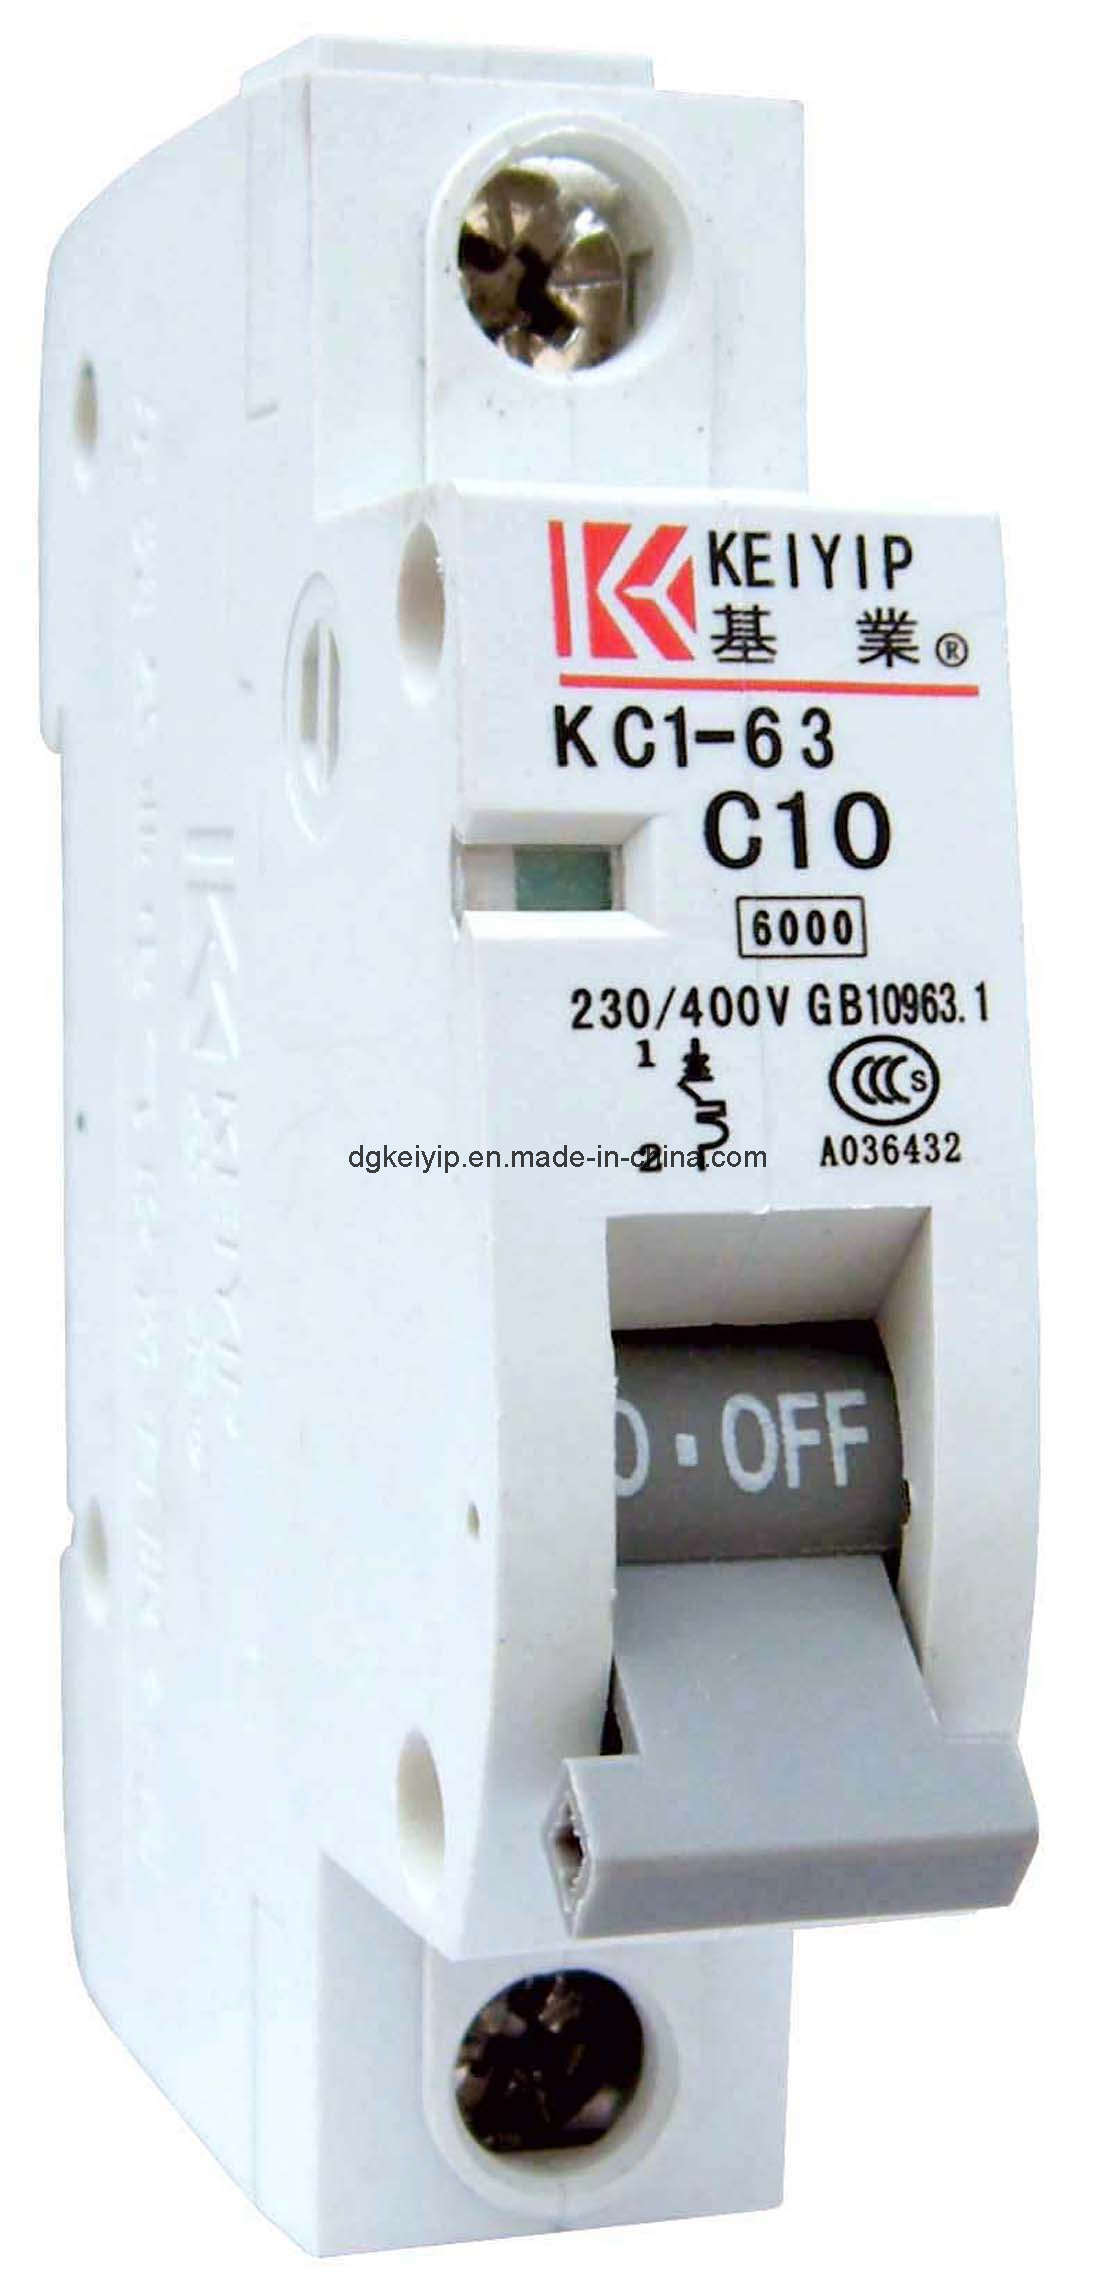 circuit breaker portable rcd rcd05 china circuit breaker rcdminiature circuit breaker kc163c10 china circuit breaker mcb